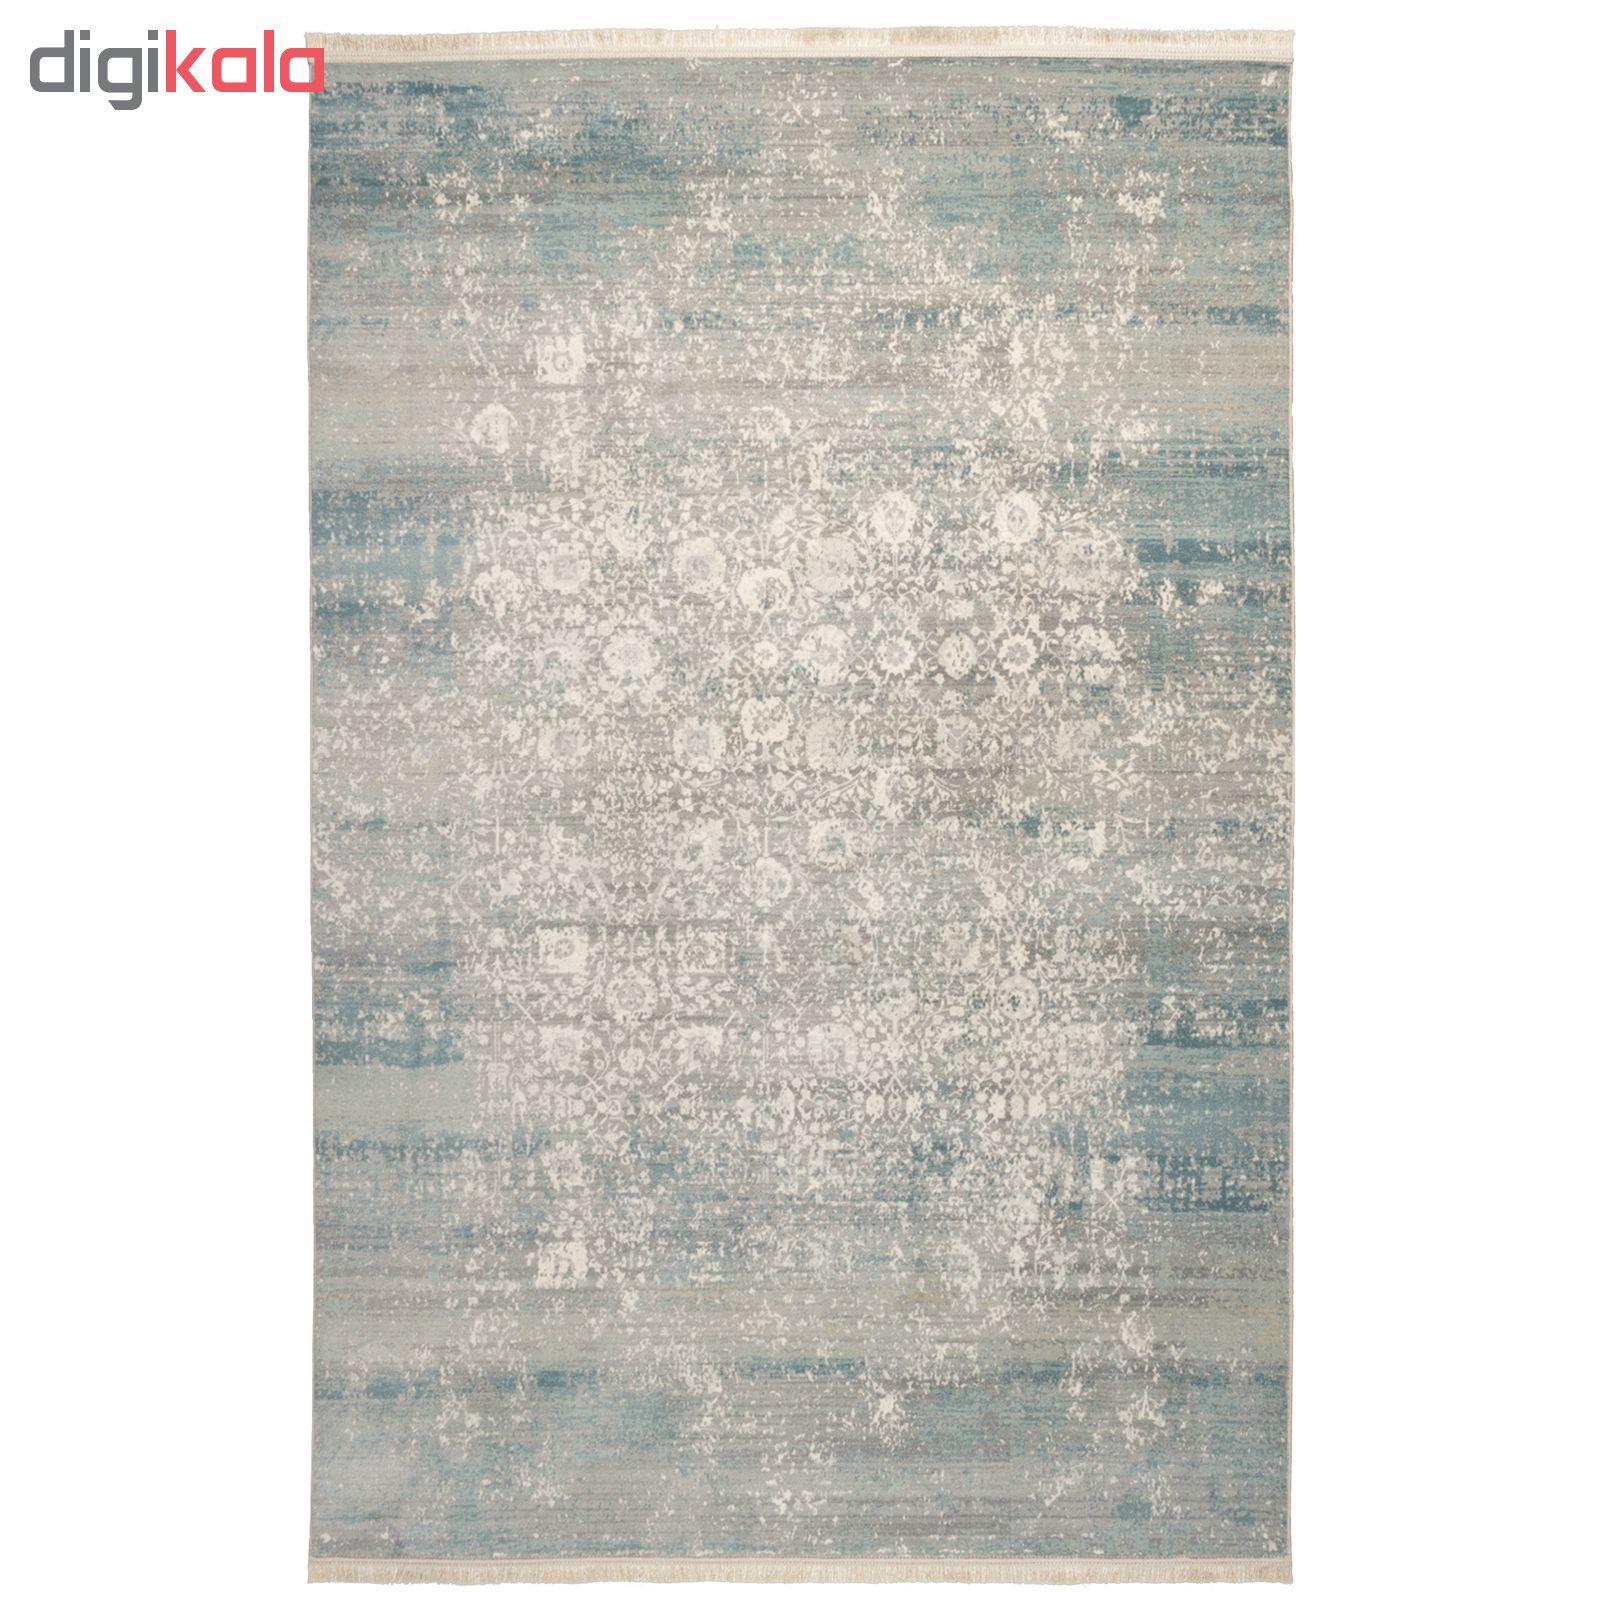 فرش ماشینی محتشم طرح کهنه نما کد 100633 زمینه خاکستری main 1 1